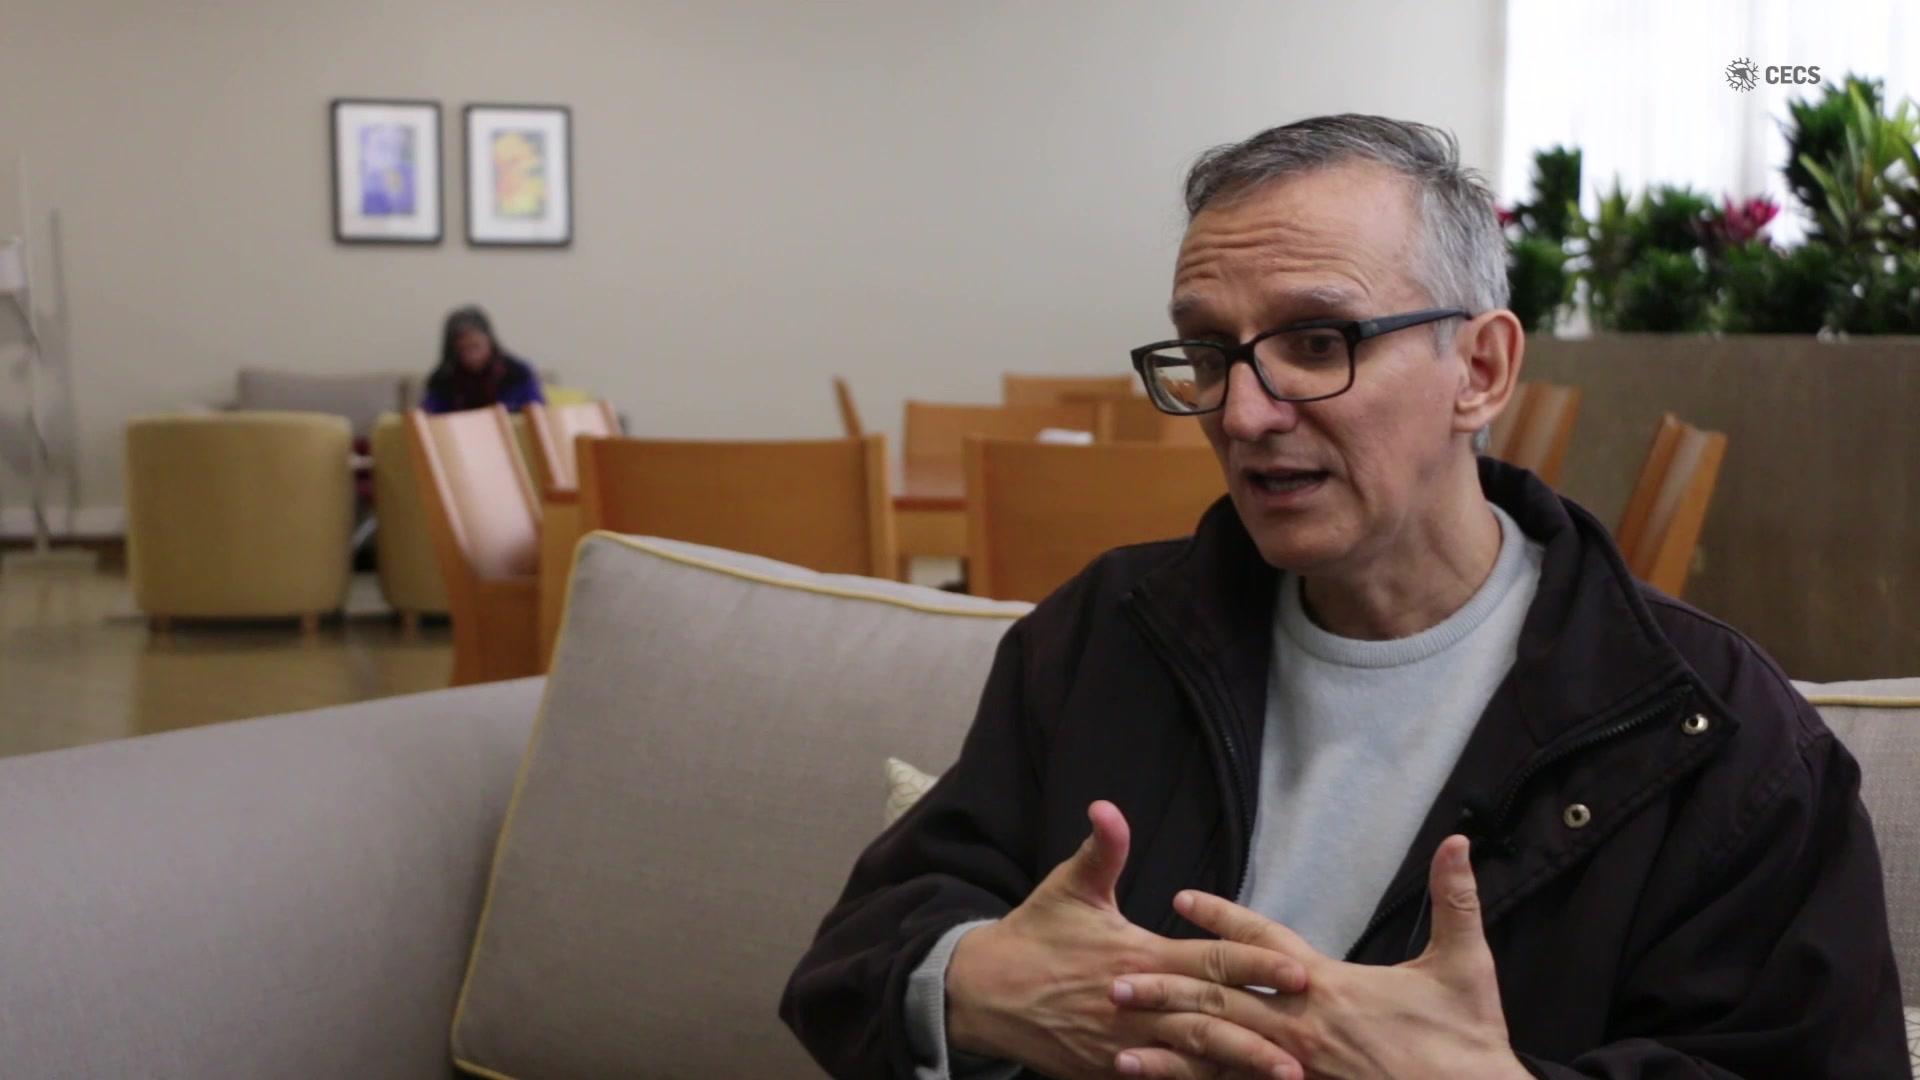 Entrevista a Juremir Machado da Silva